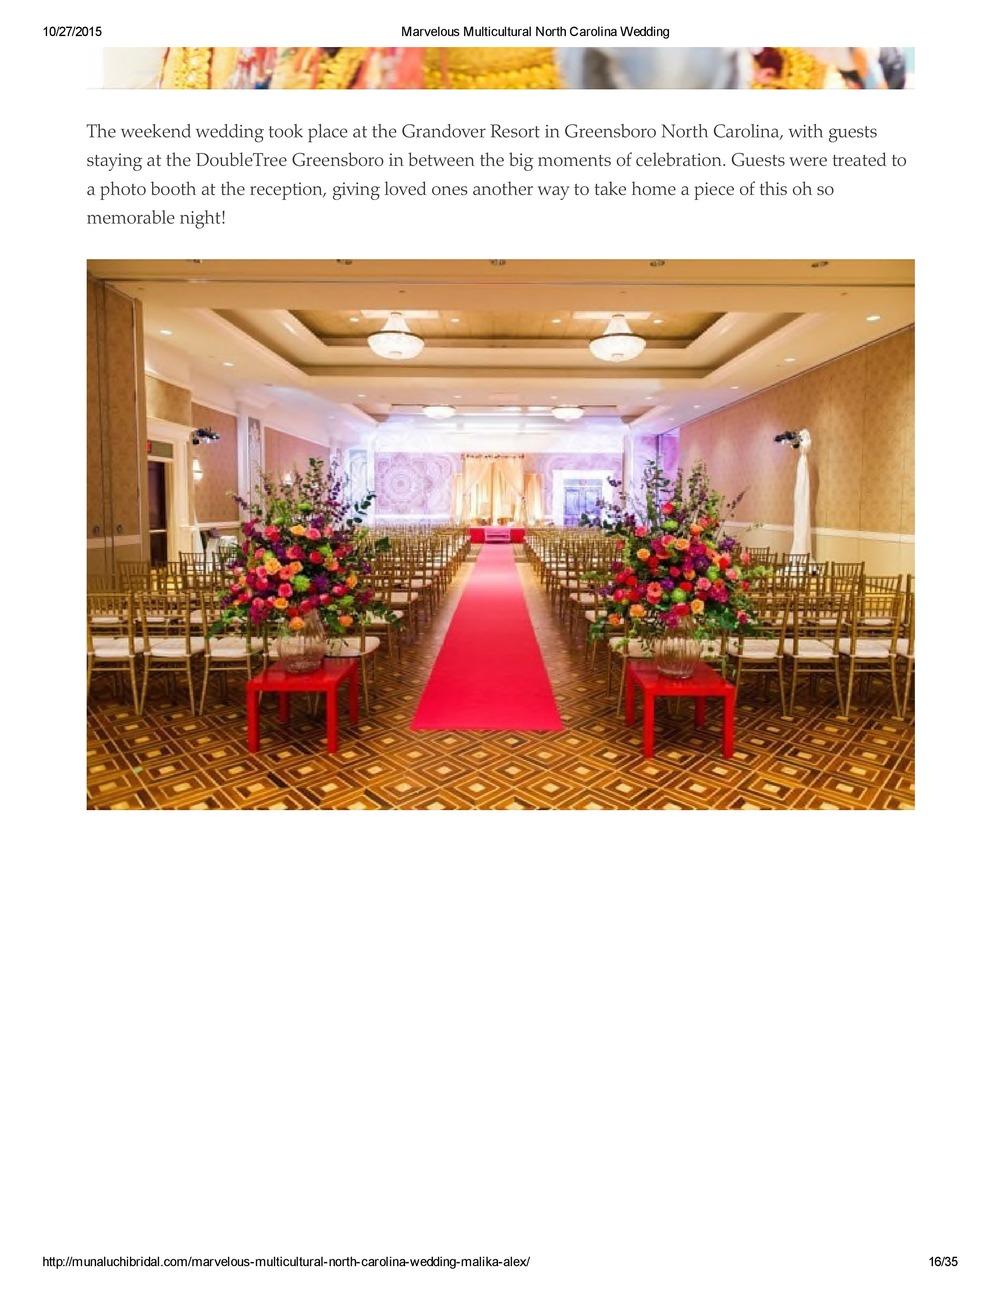 Marvelous Multicultural North Carolina Wedding - Alex & Malika-page-15.jpg